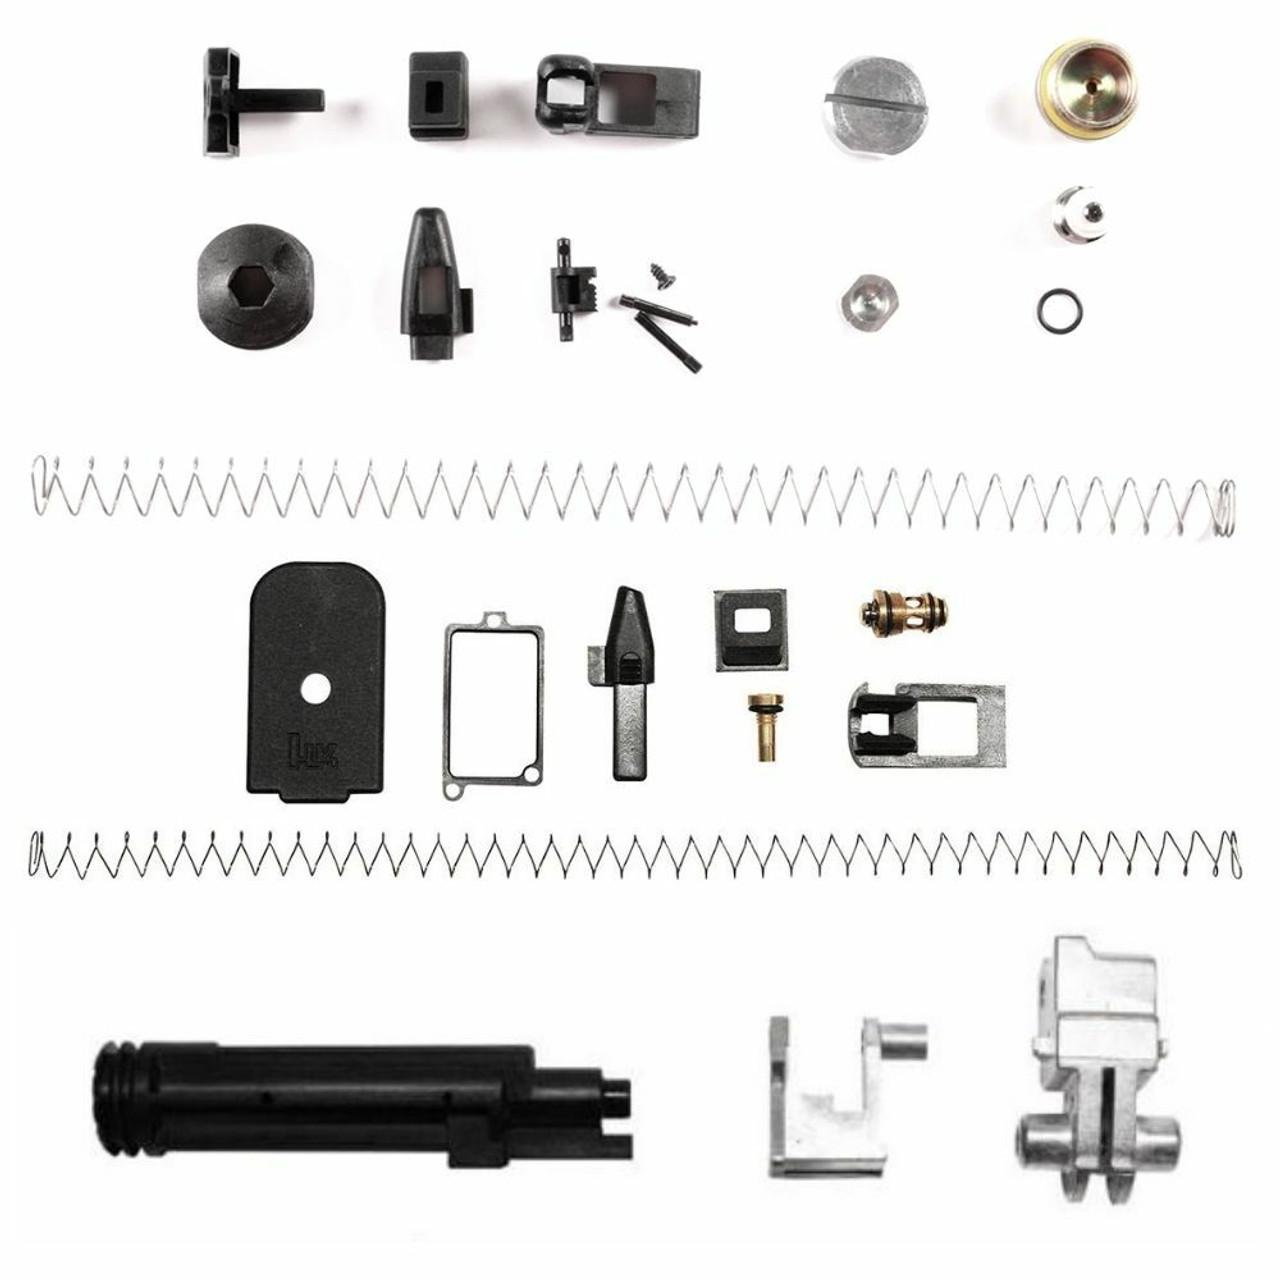 Airsoft Gun Rebuild Kits & Gas Blowback Pistols